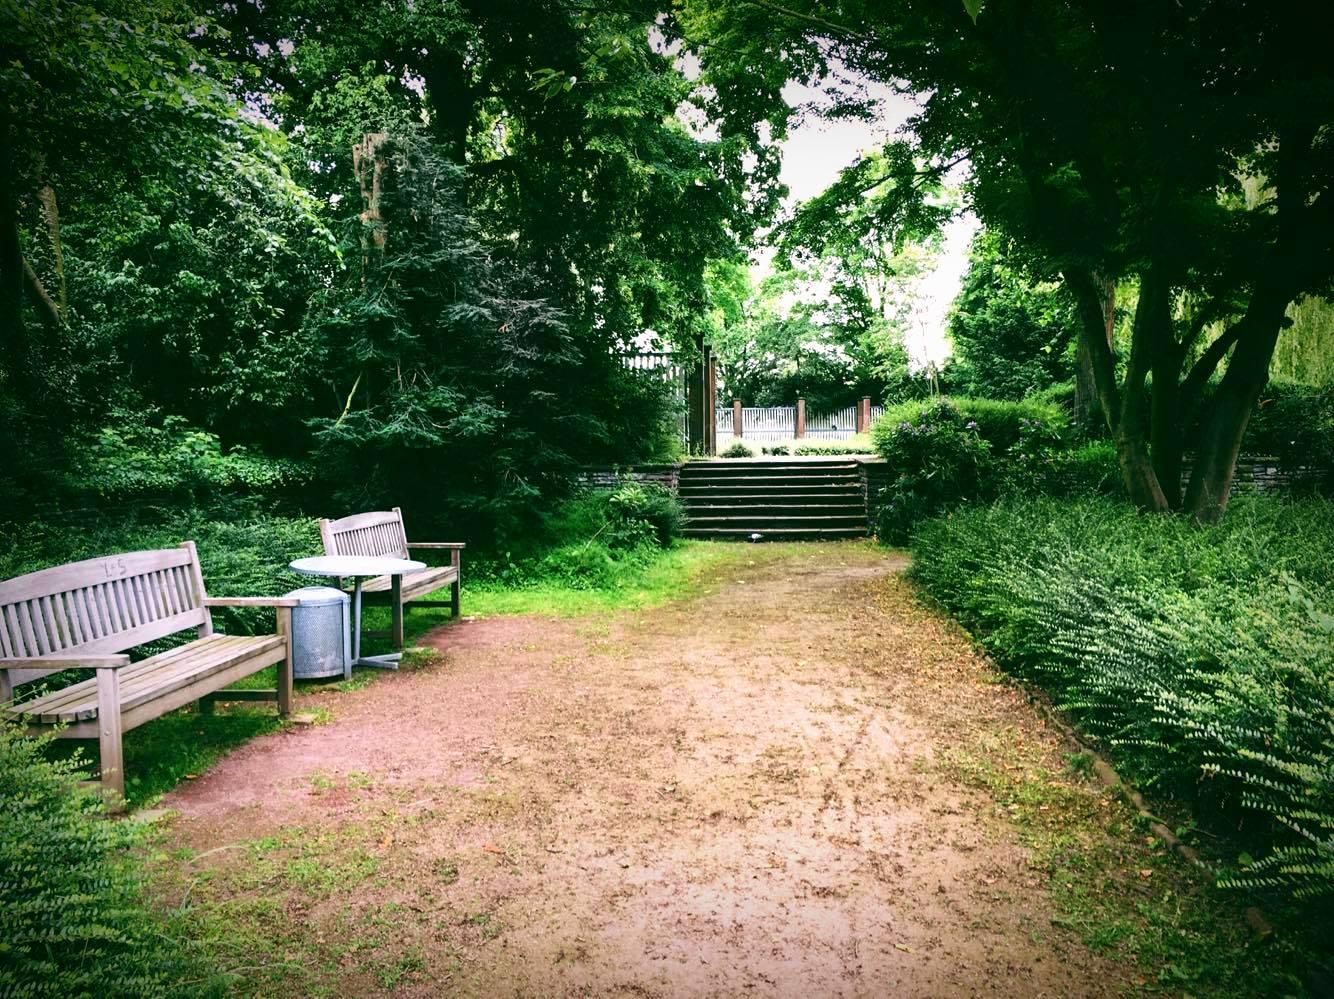 Foto: Einsame Treppe